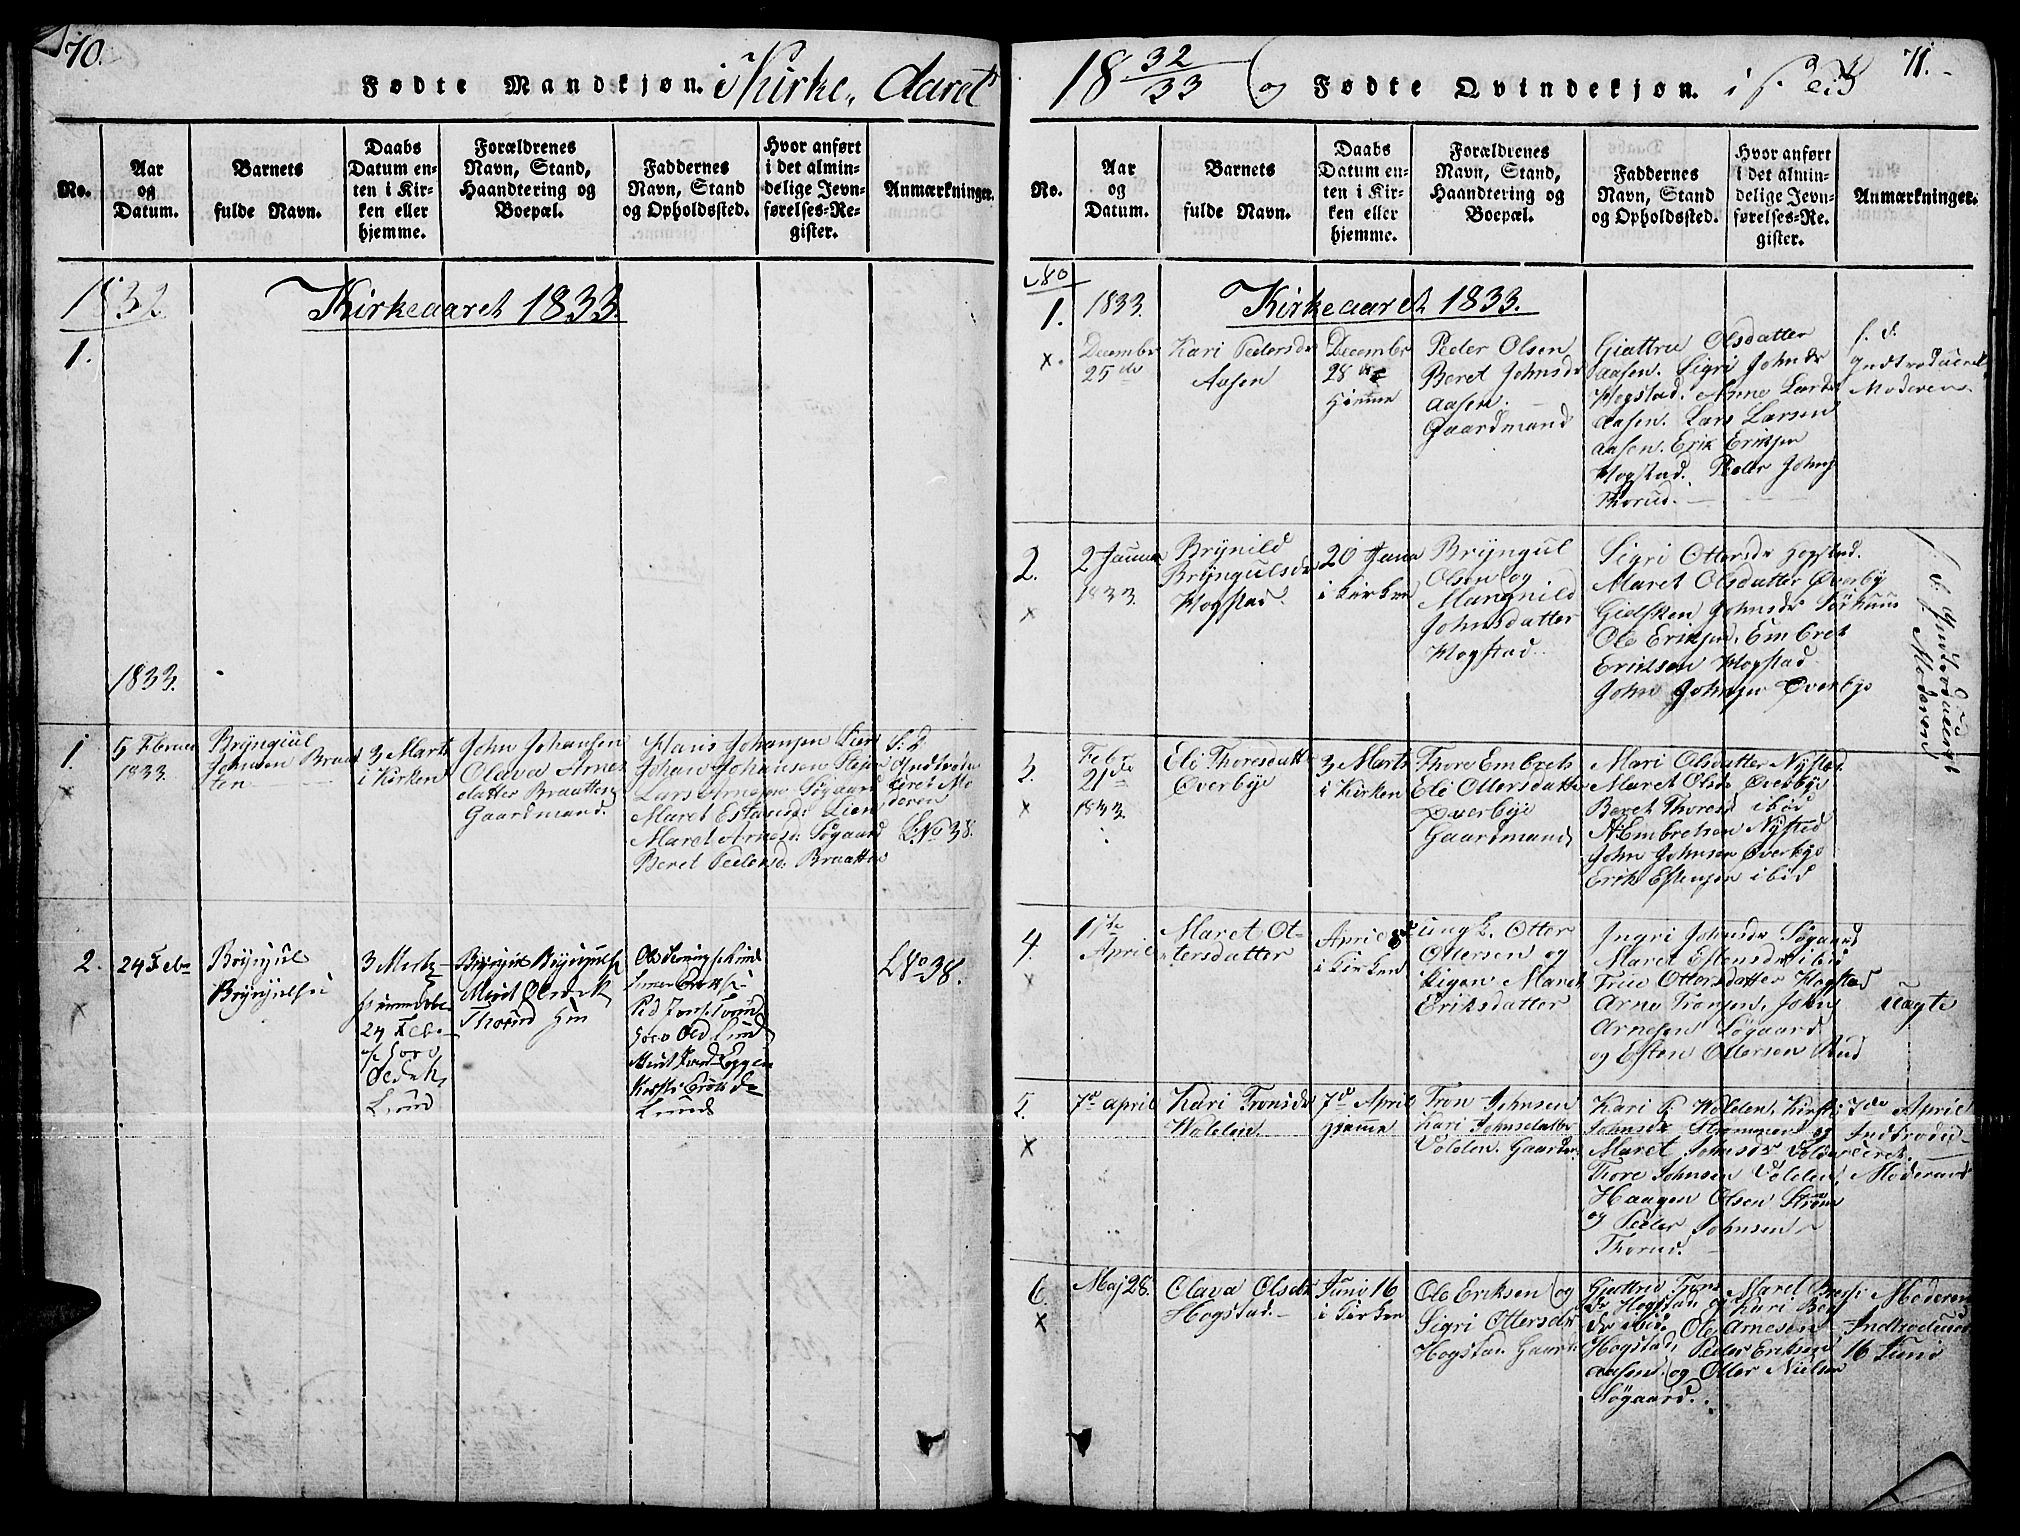 SAH, Tynset prestekontor, Klokkerbok nr. 4, 1814-1879, s. 70-71